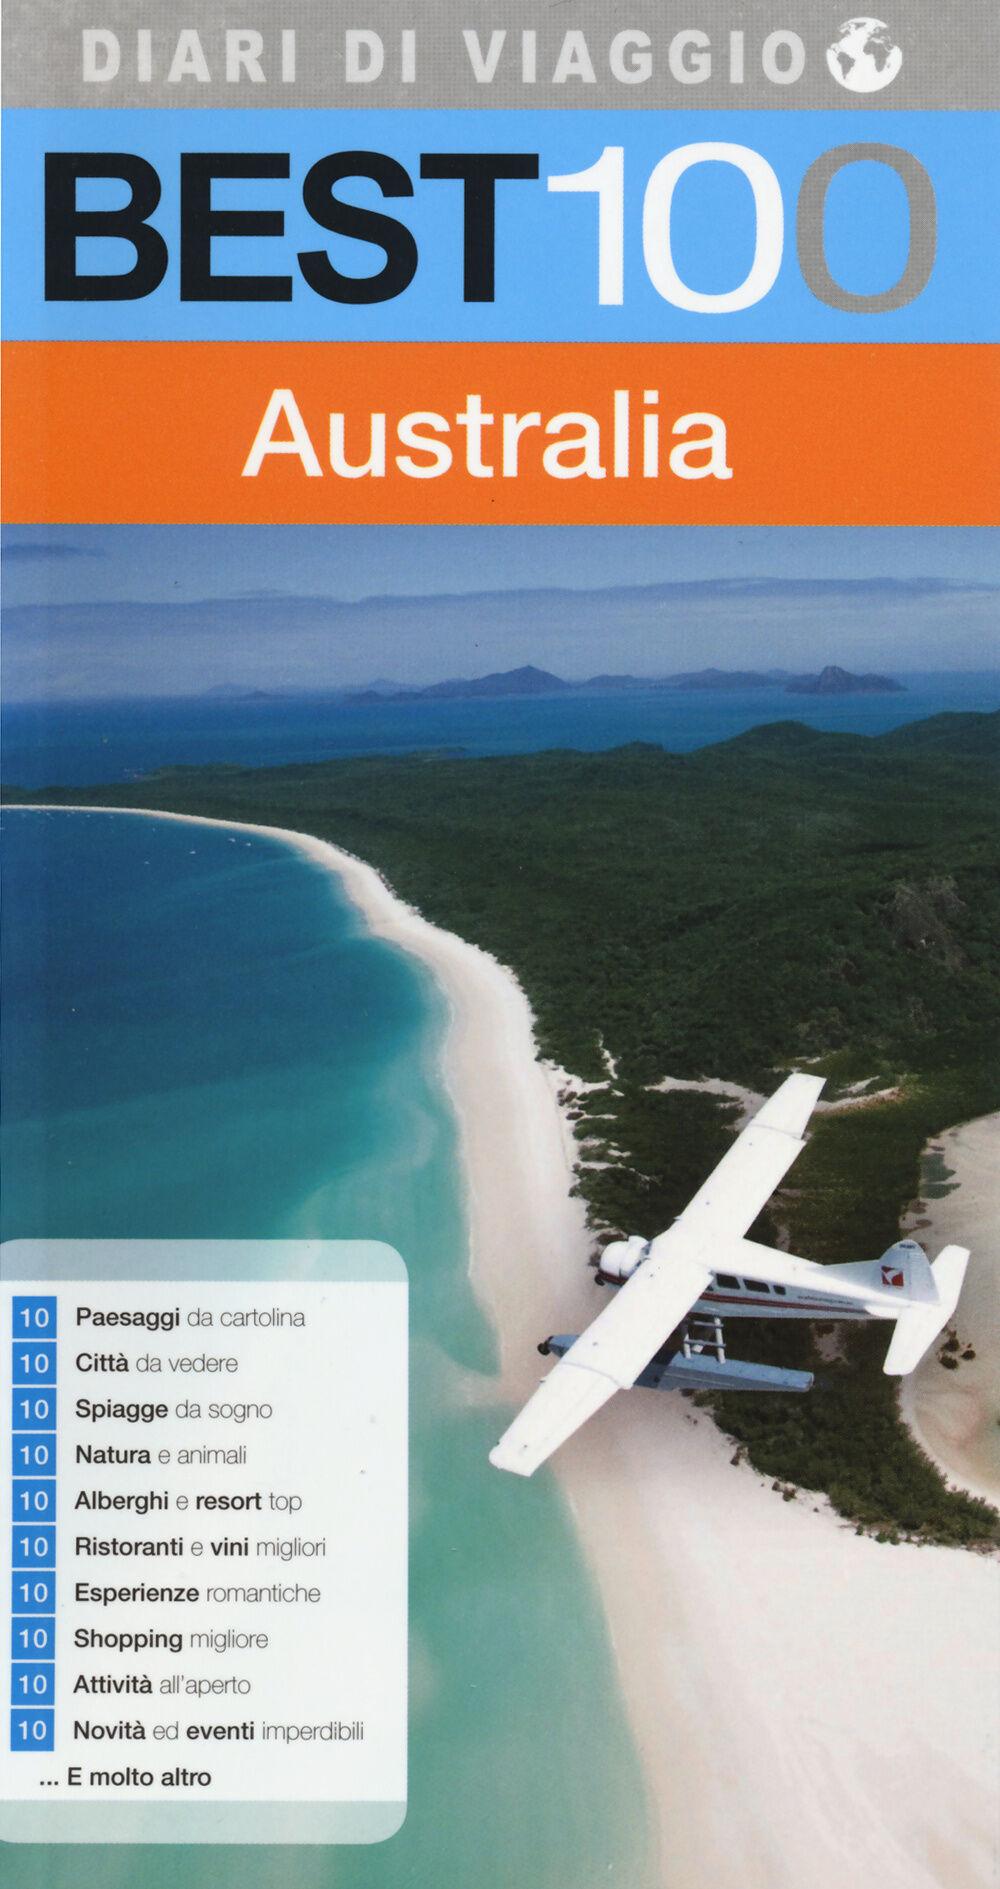 Best 100 Australia